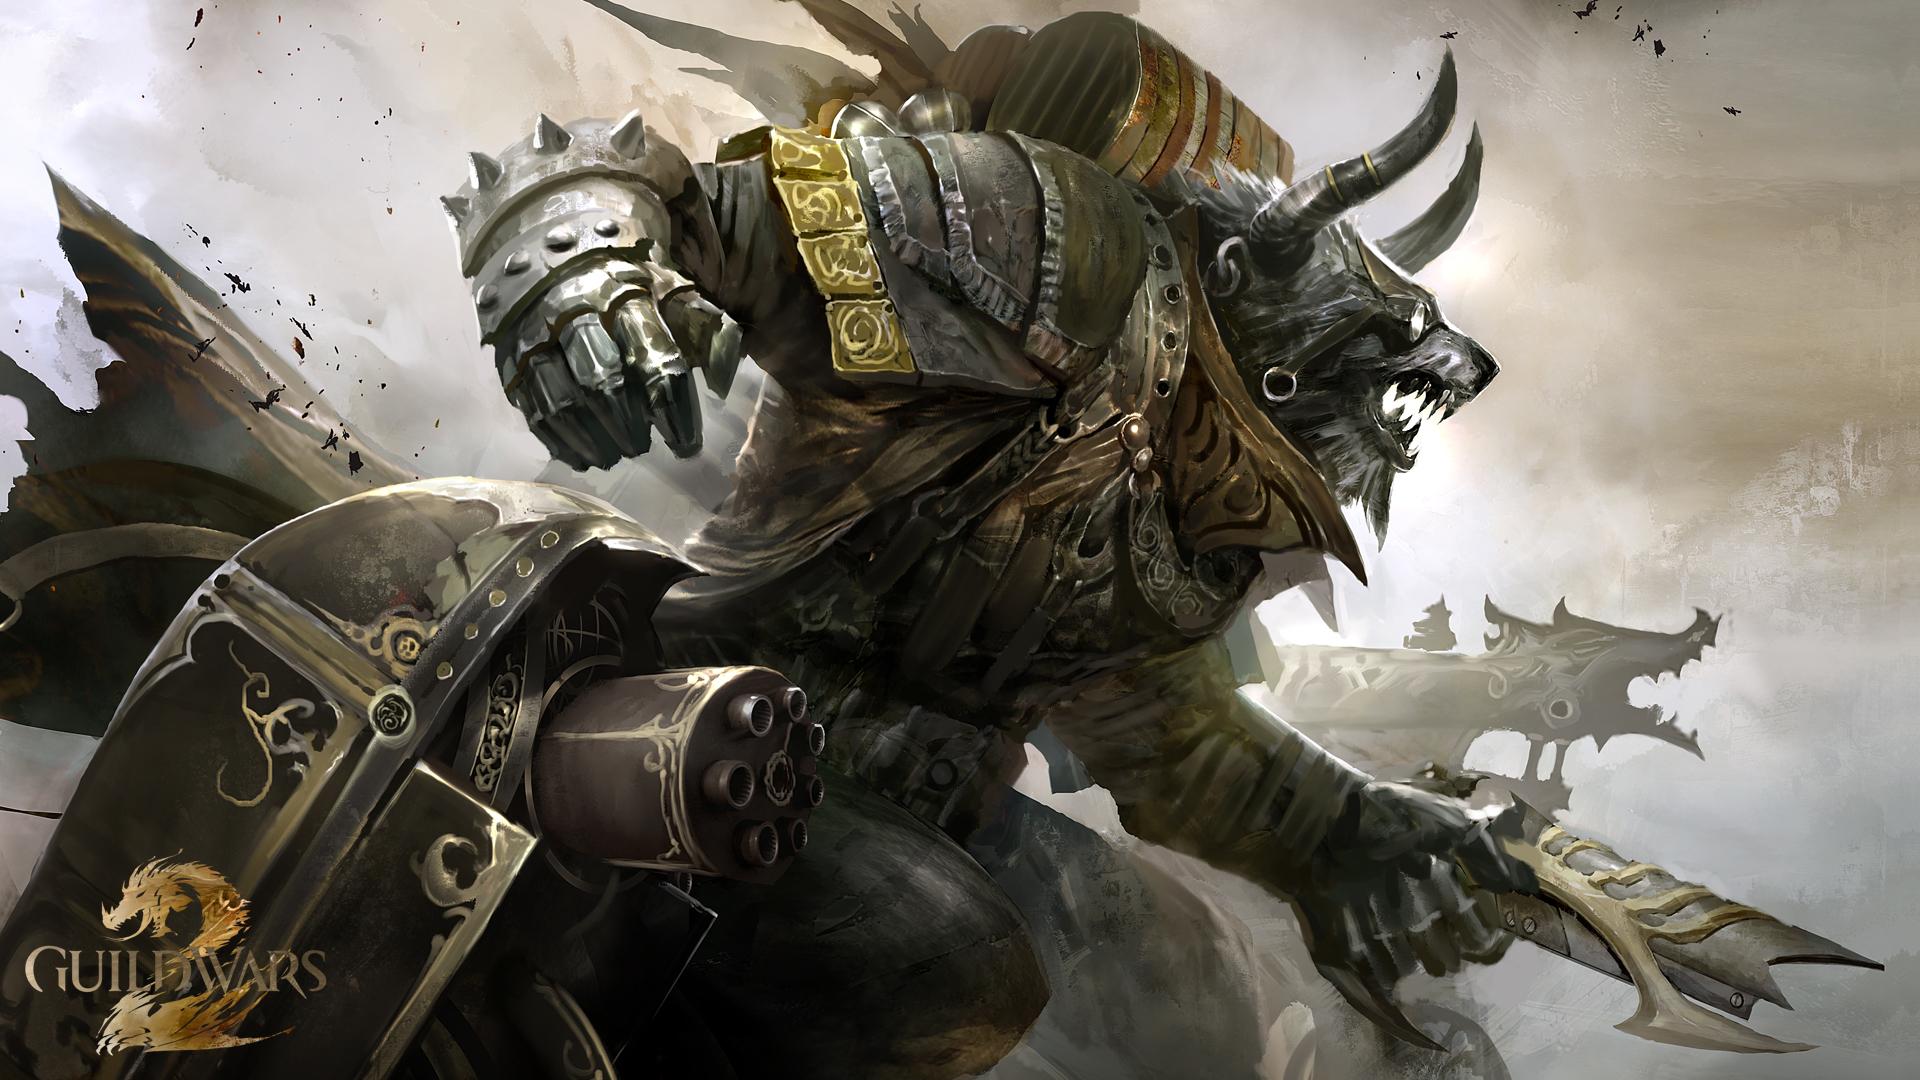 Guild Wars 2, Arenanet, MMO, MMORPG, RPG, WvW, World vs. World, PvP, Player vs. Player